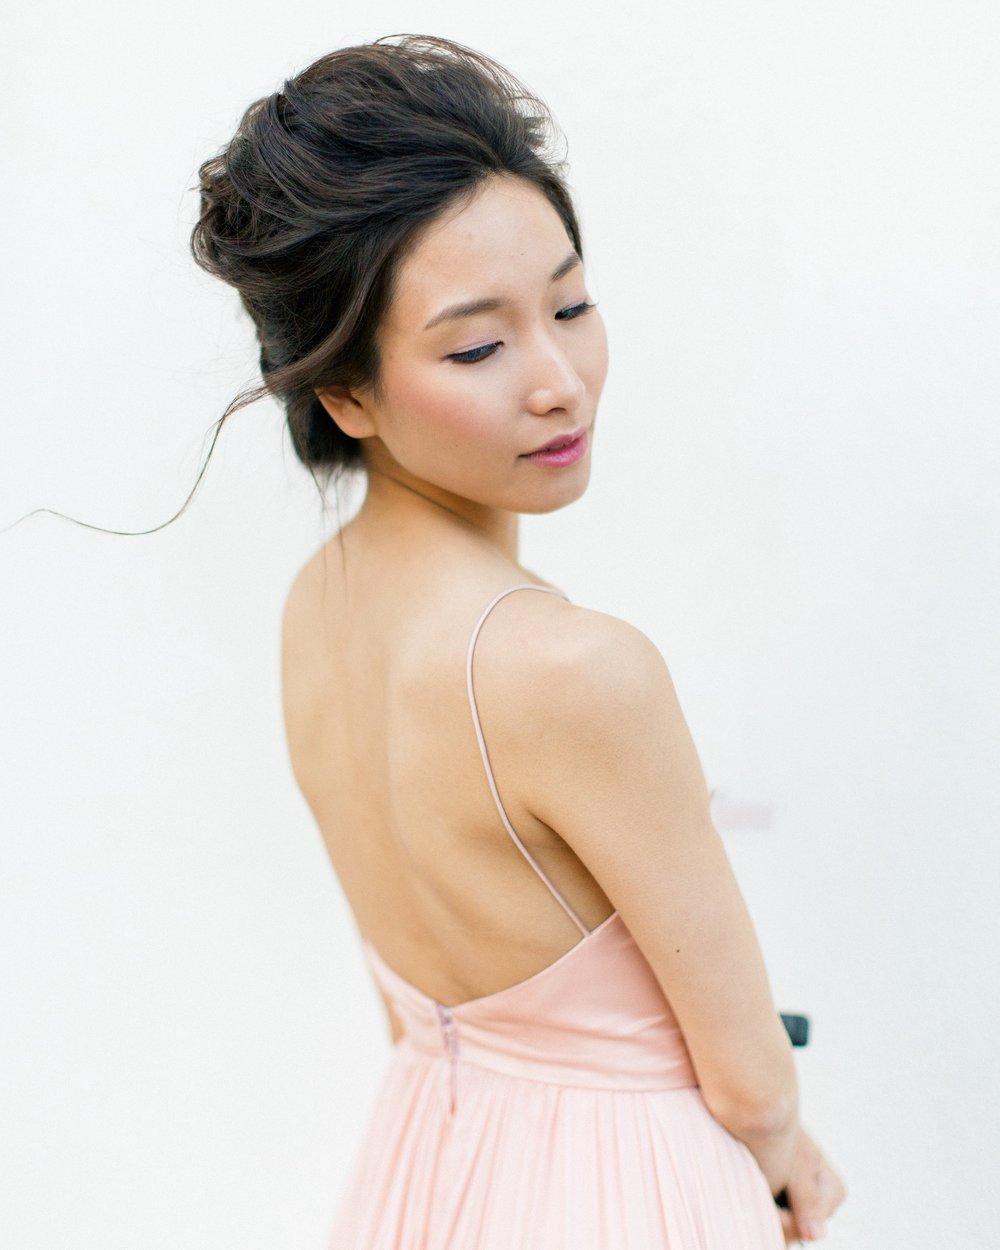 Photographer: Jen Sosa | Hair: Genie Chung // E2 Beauty | Makeup by Ashley Tani